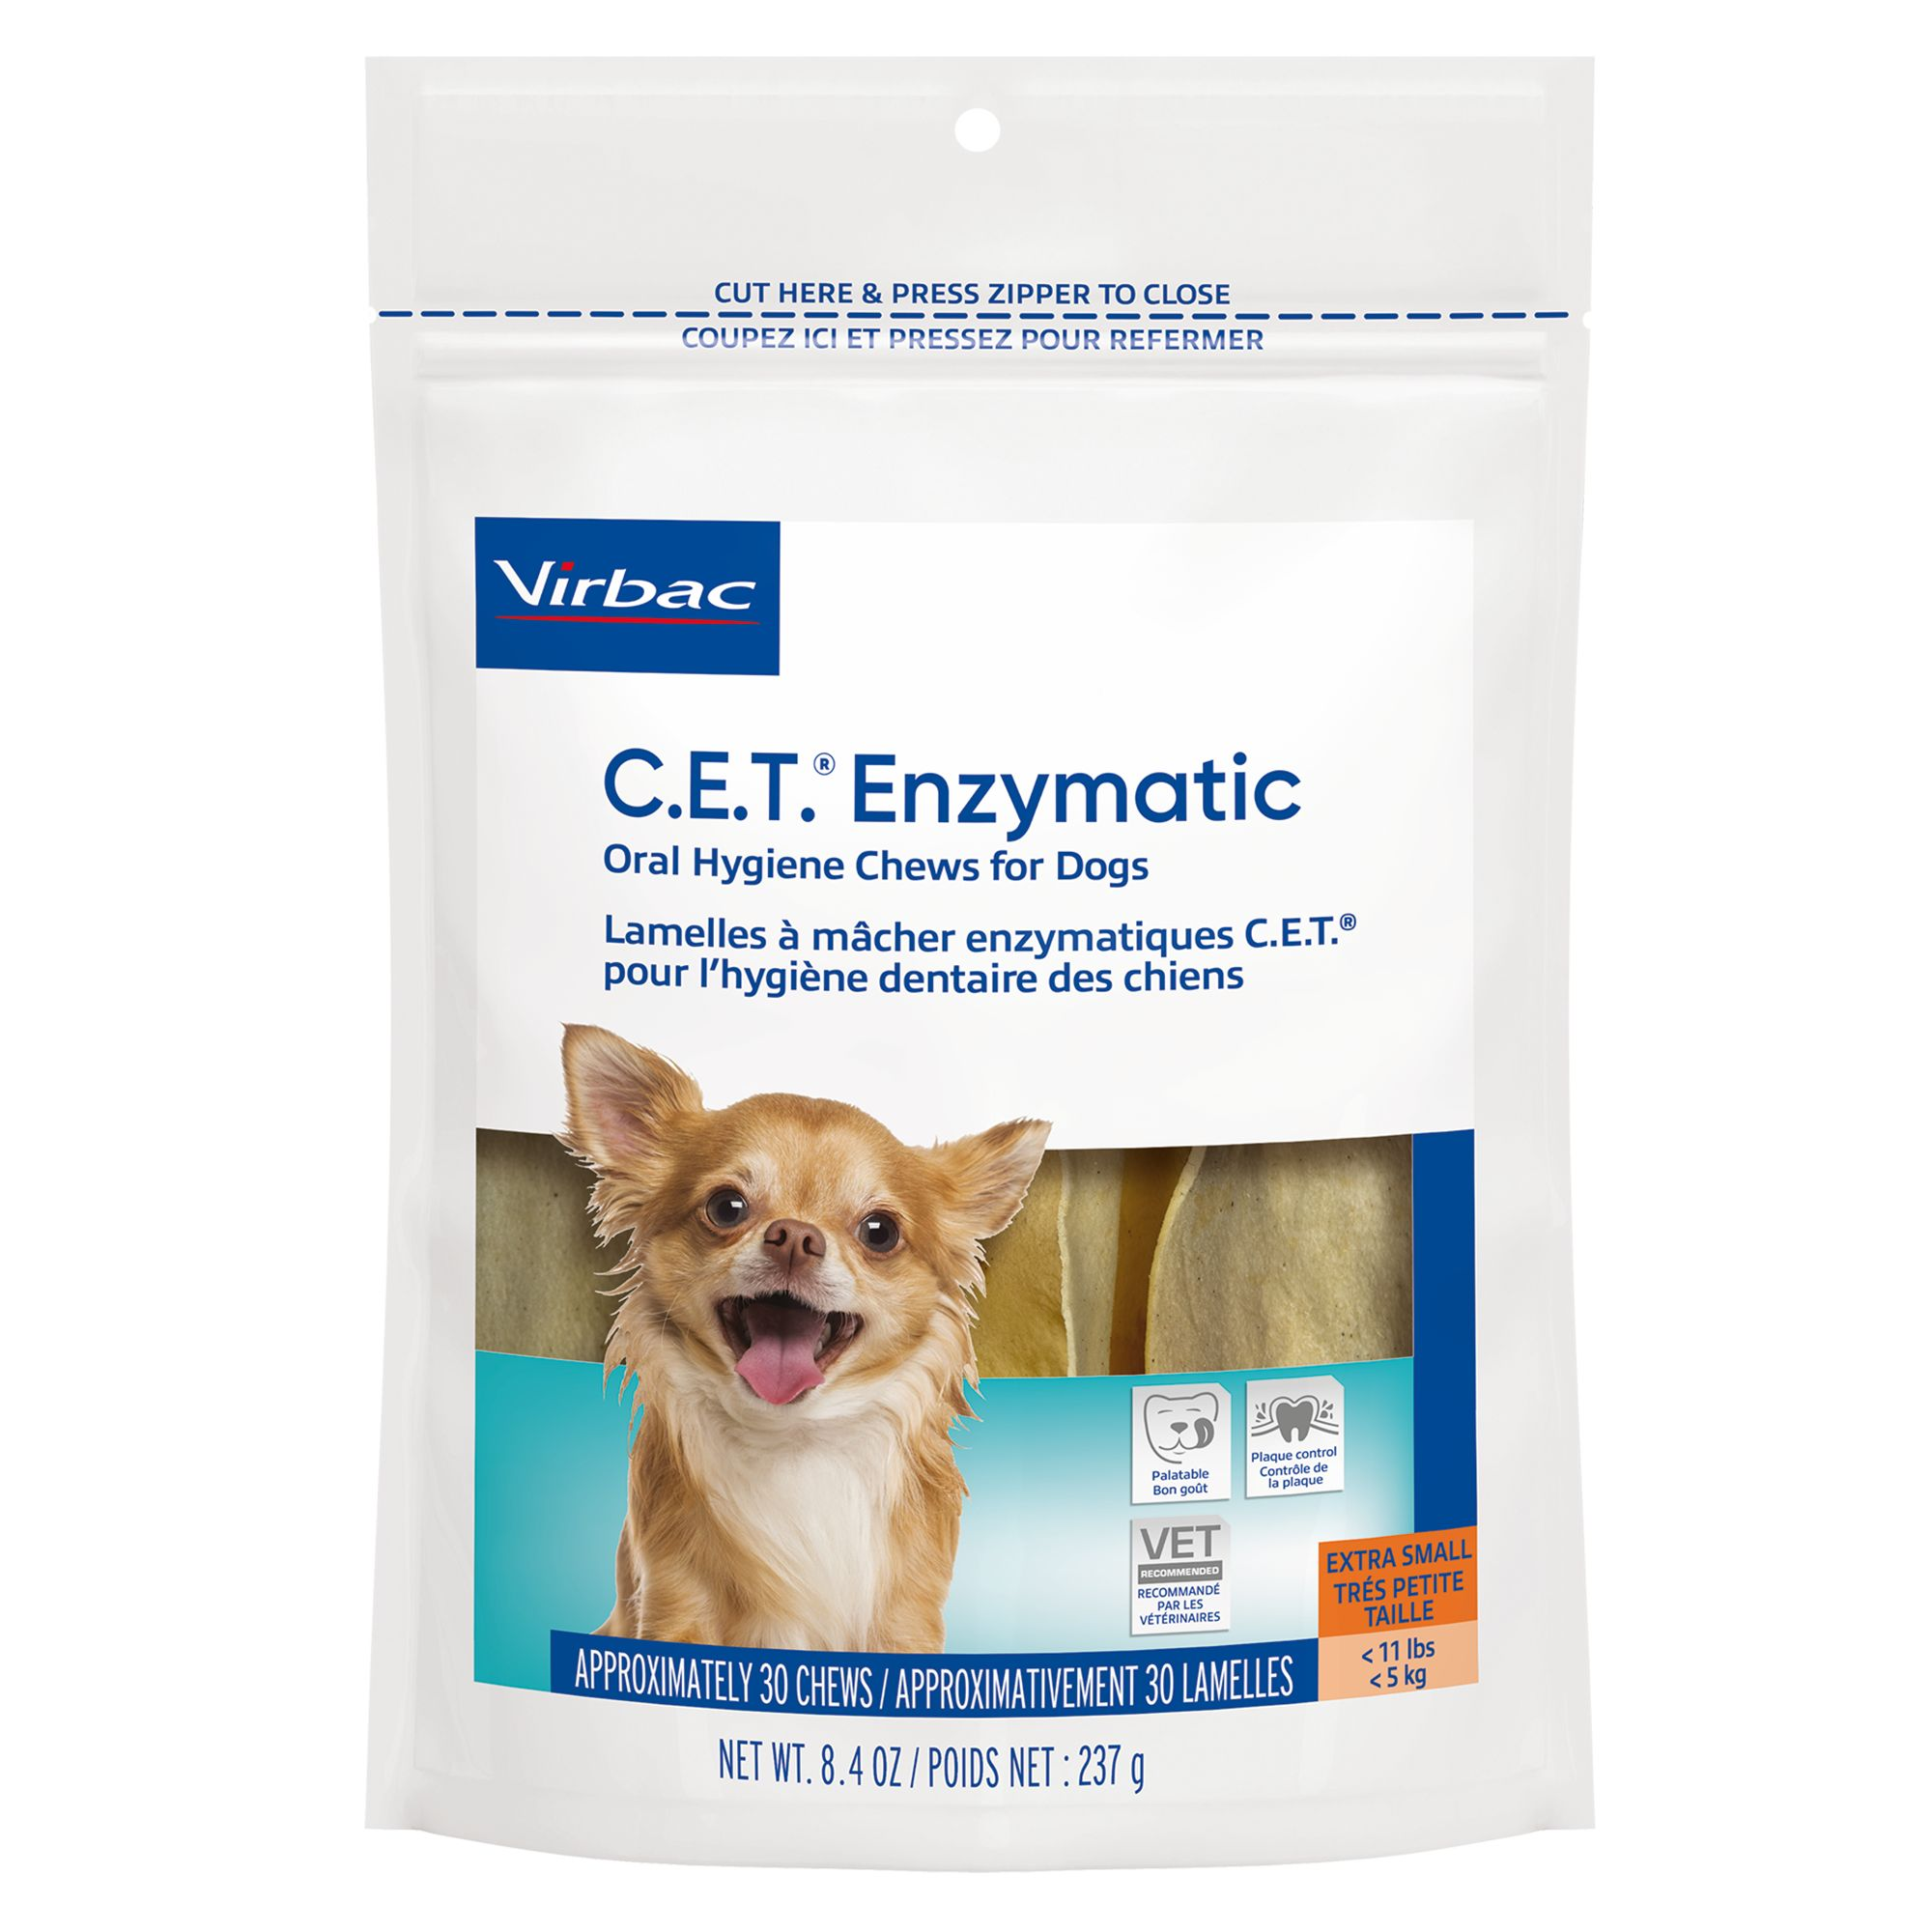 Virbac C.e.t Home Dental Care Dog Chews Size Petite